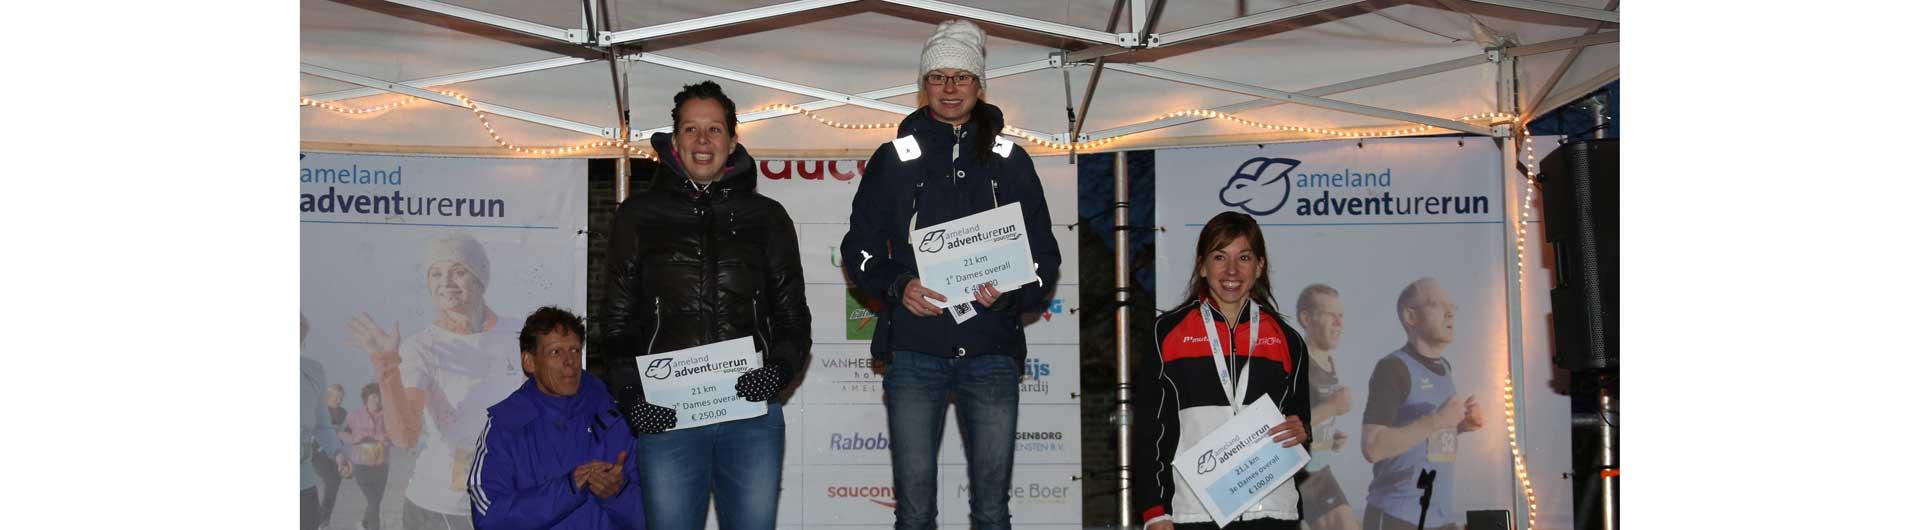 Ameland Adventurerun persbericht: winnaars 12e editie